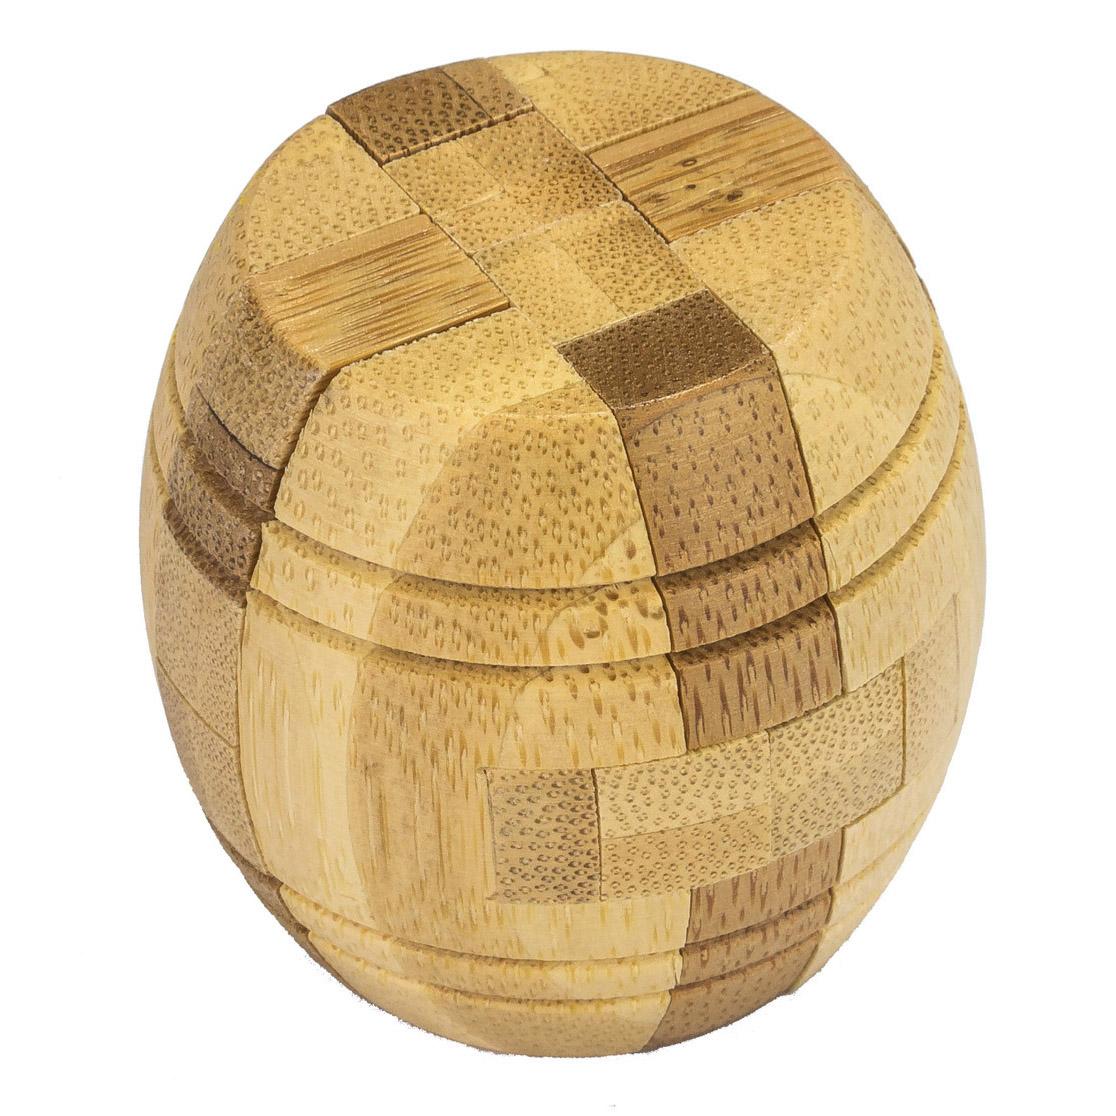 1202 - Mini Bamboozlers - Barrel - Open